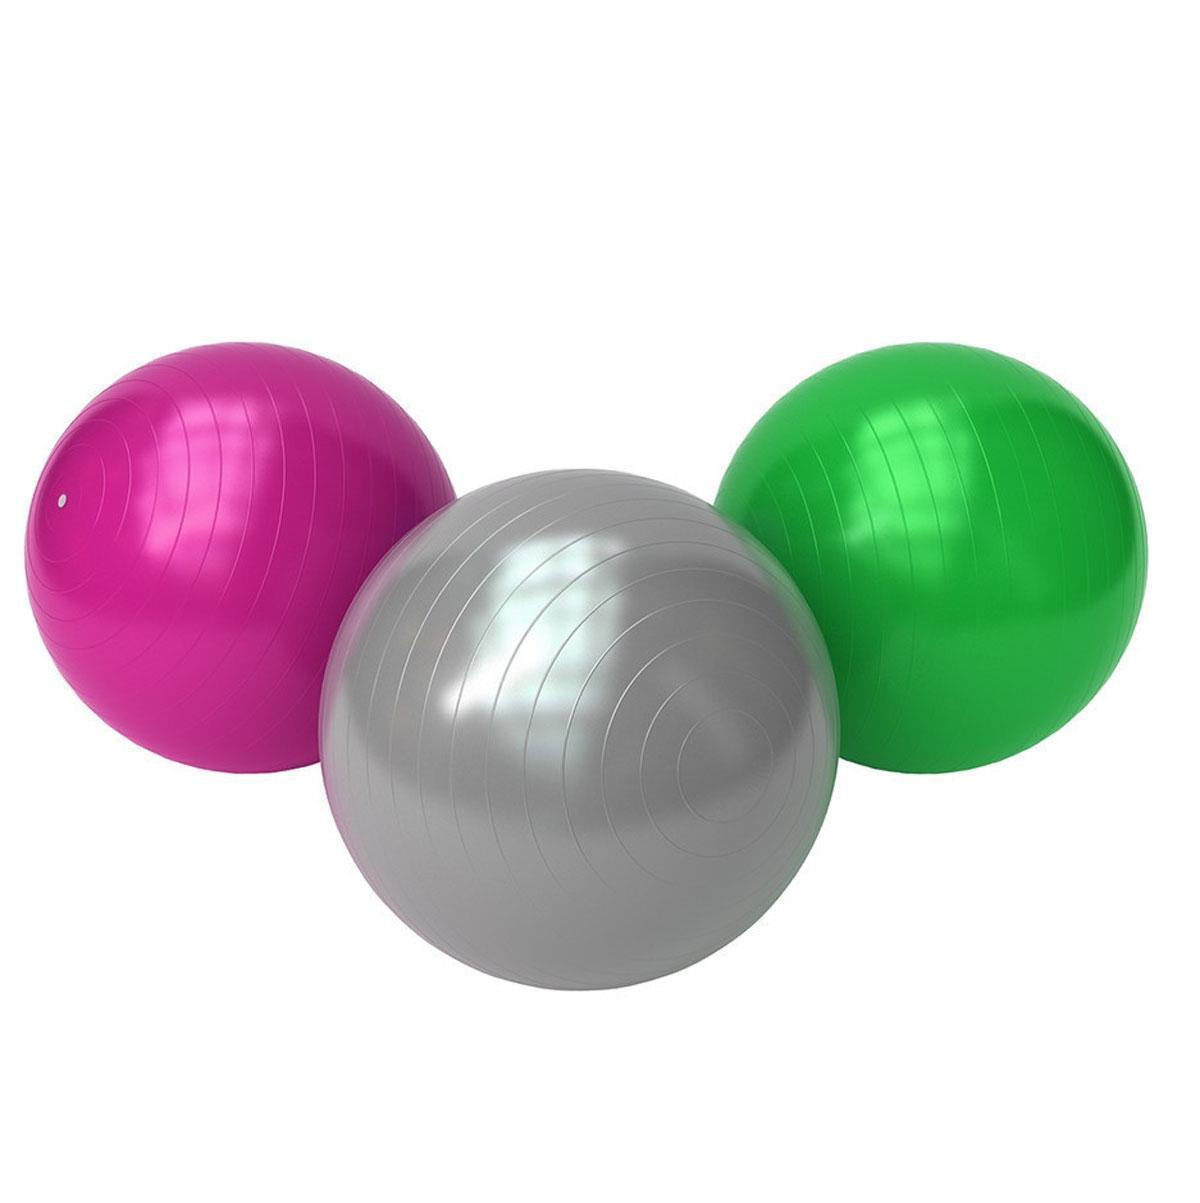 Мяч гимнастический (Фитбол) оригинал BODY 75 см